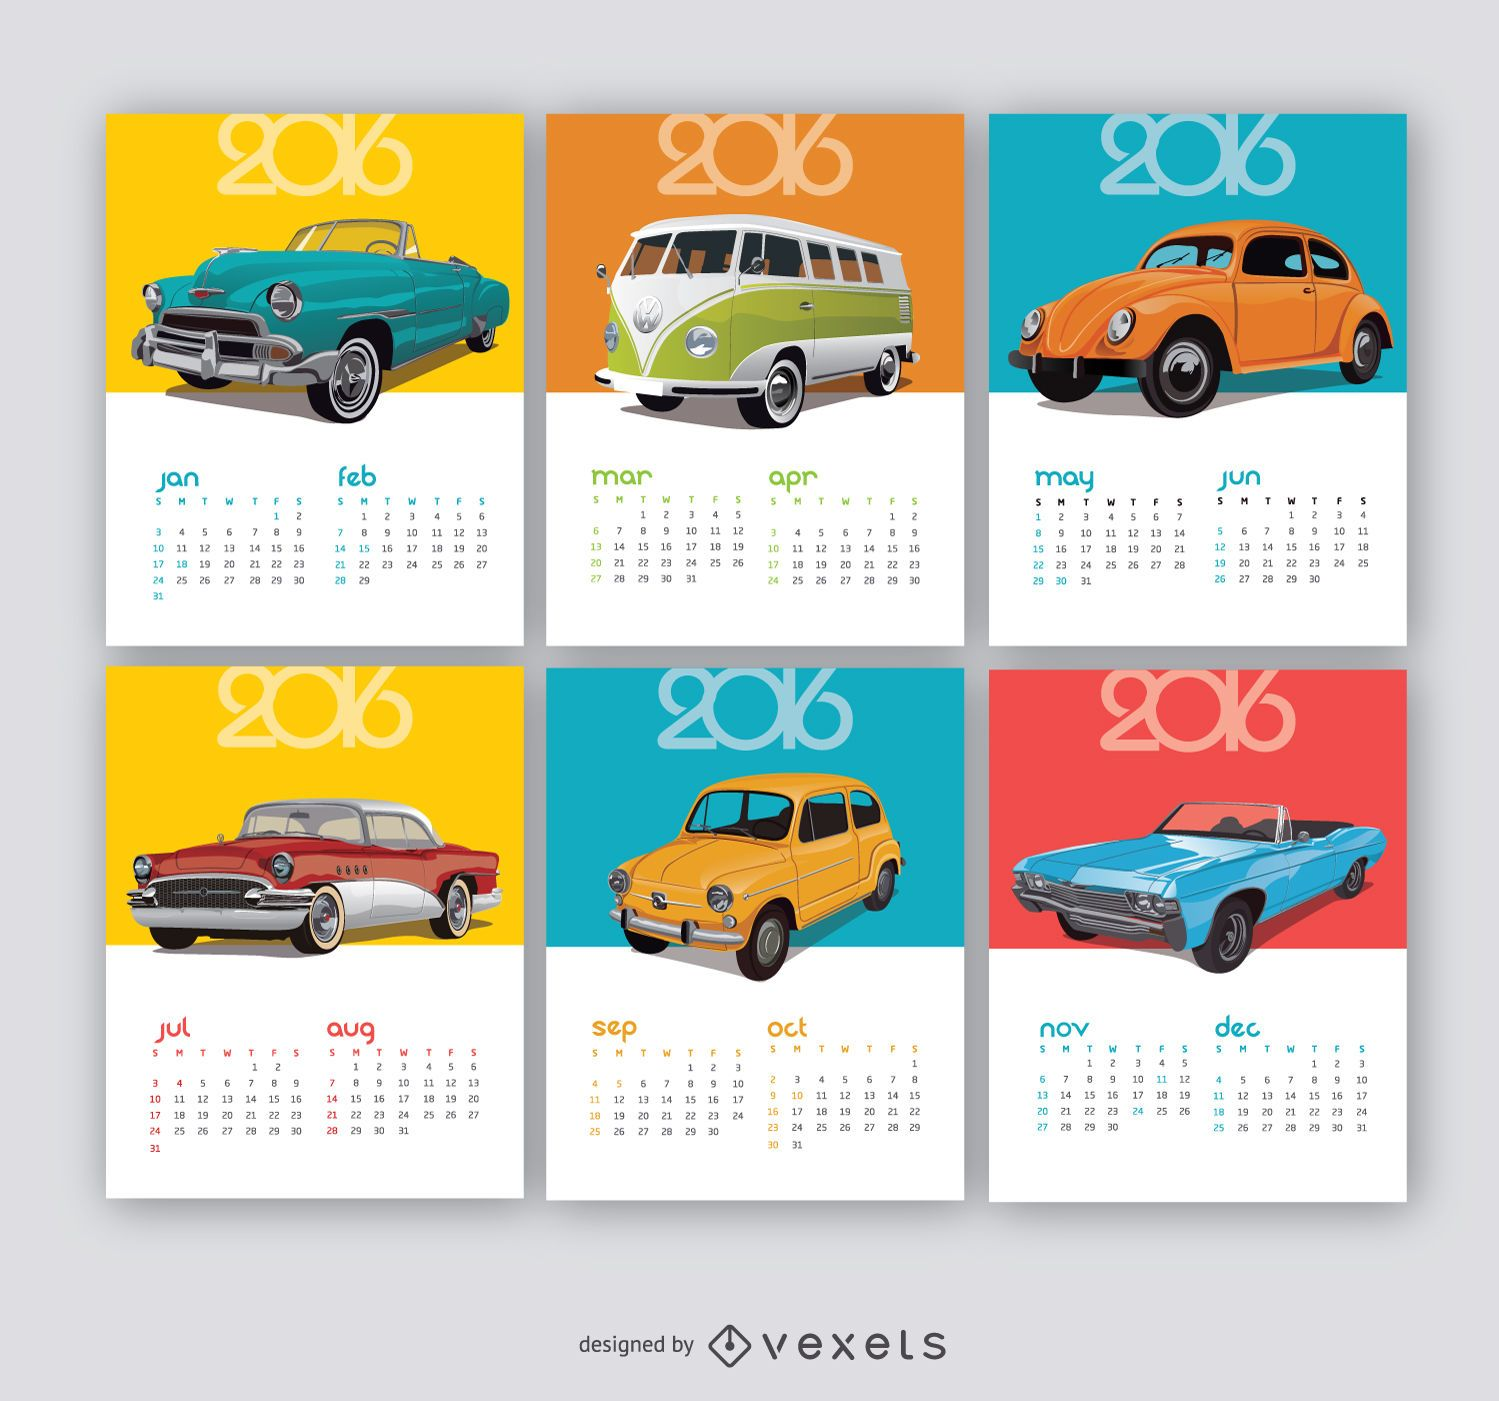 2016 Calendar Vintage cars - Vector download